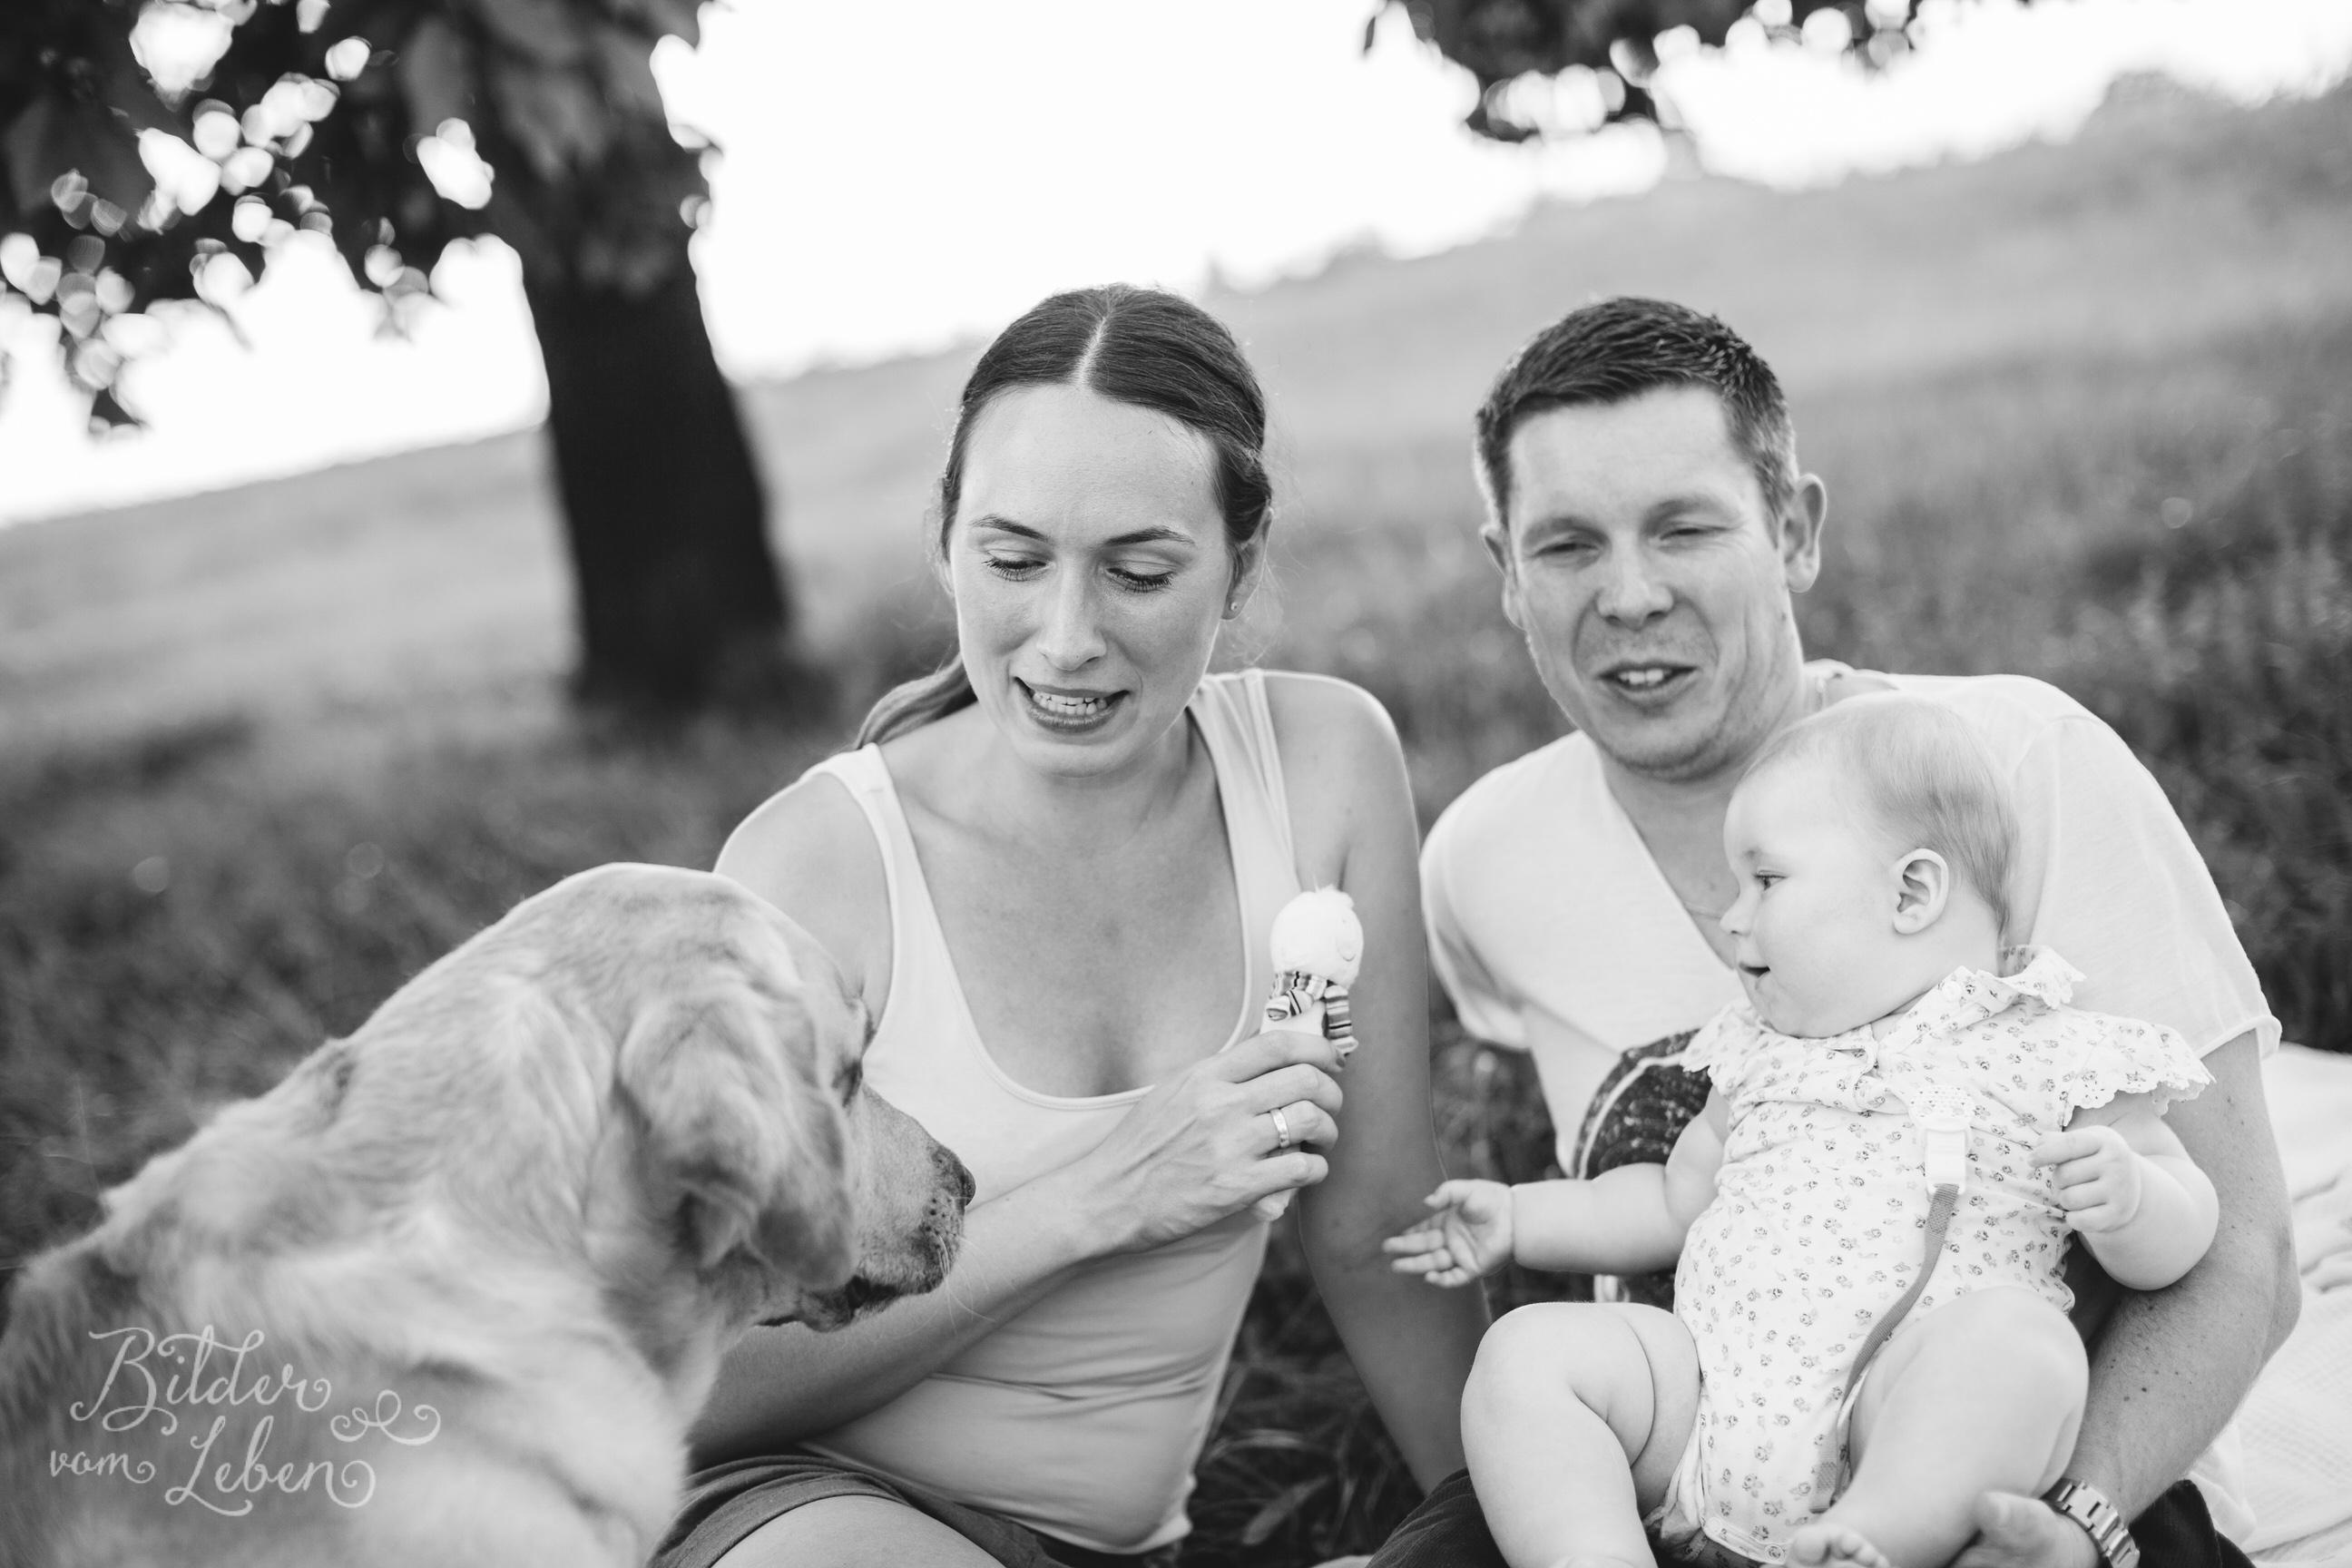 Greta-Labrador-Kinder-Portraits-BildervomLeben-2016-8202